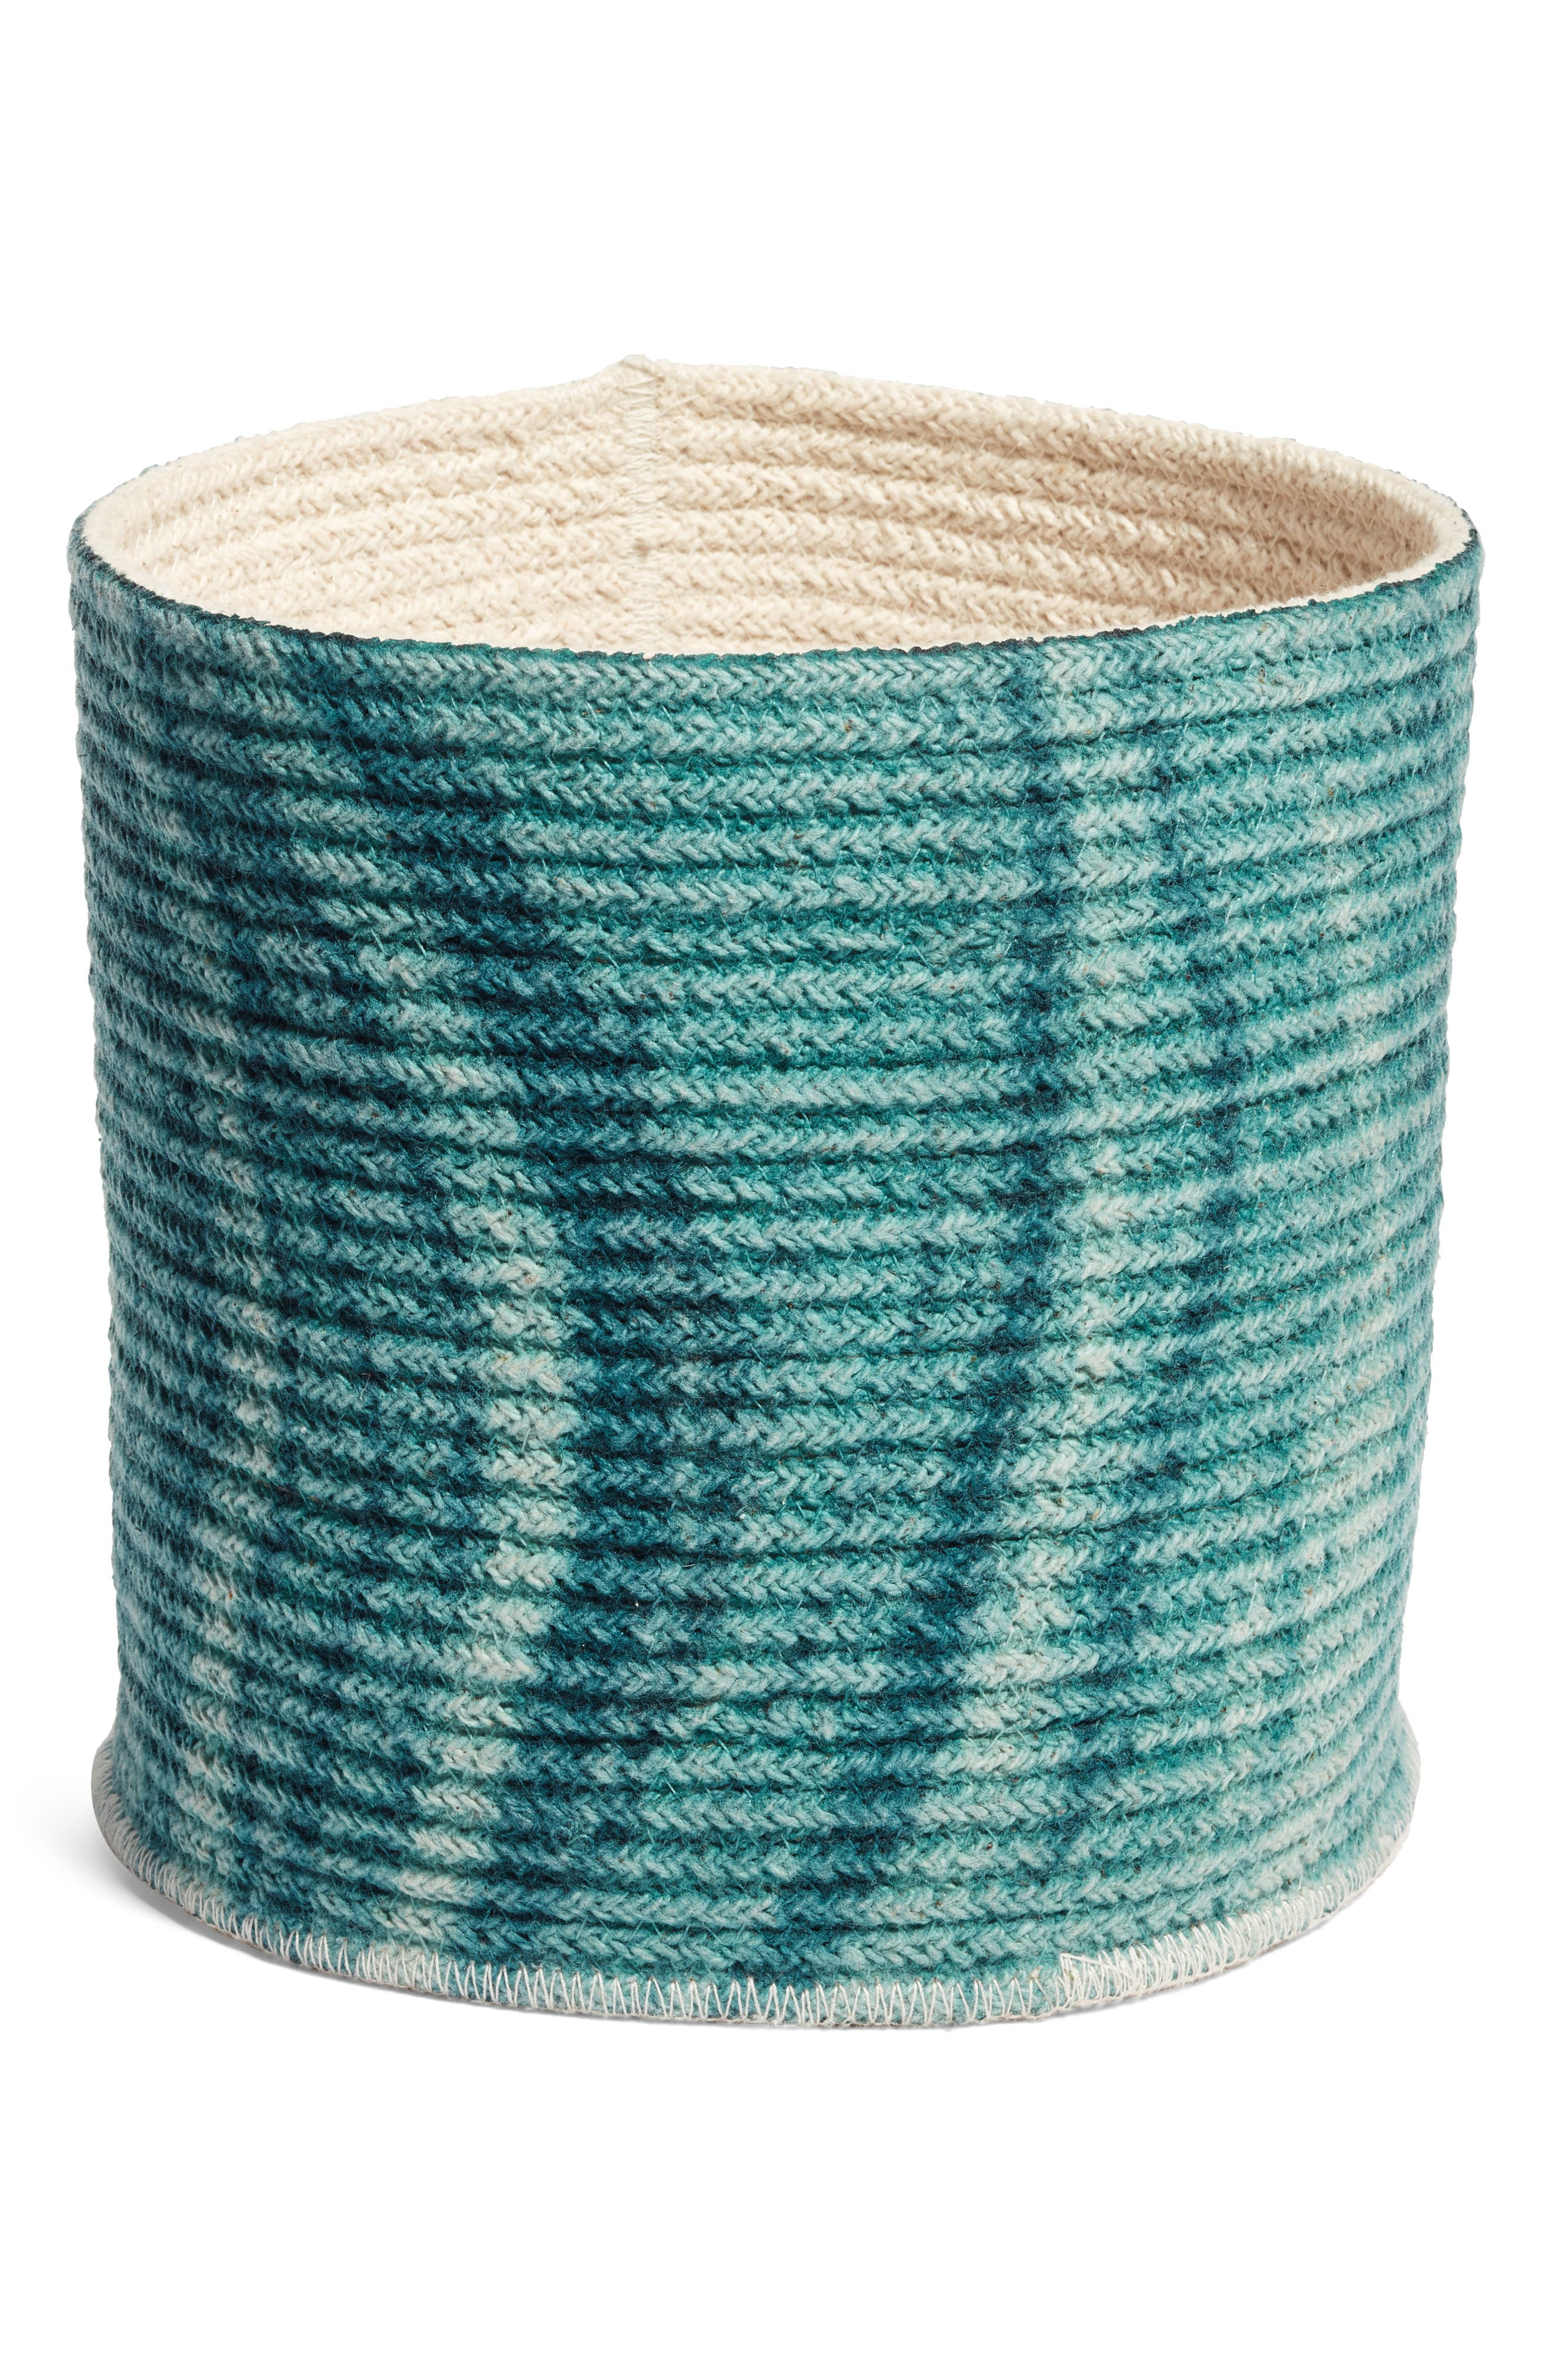 Oceana Woven Basket,                         Main,                         color, Teal Hydro